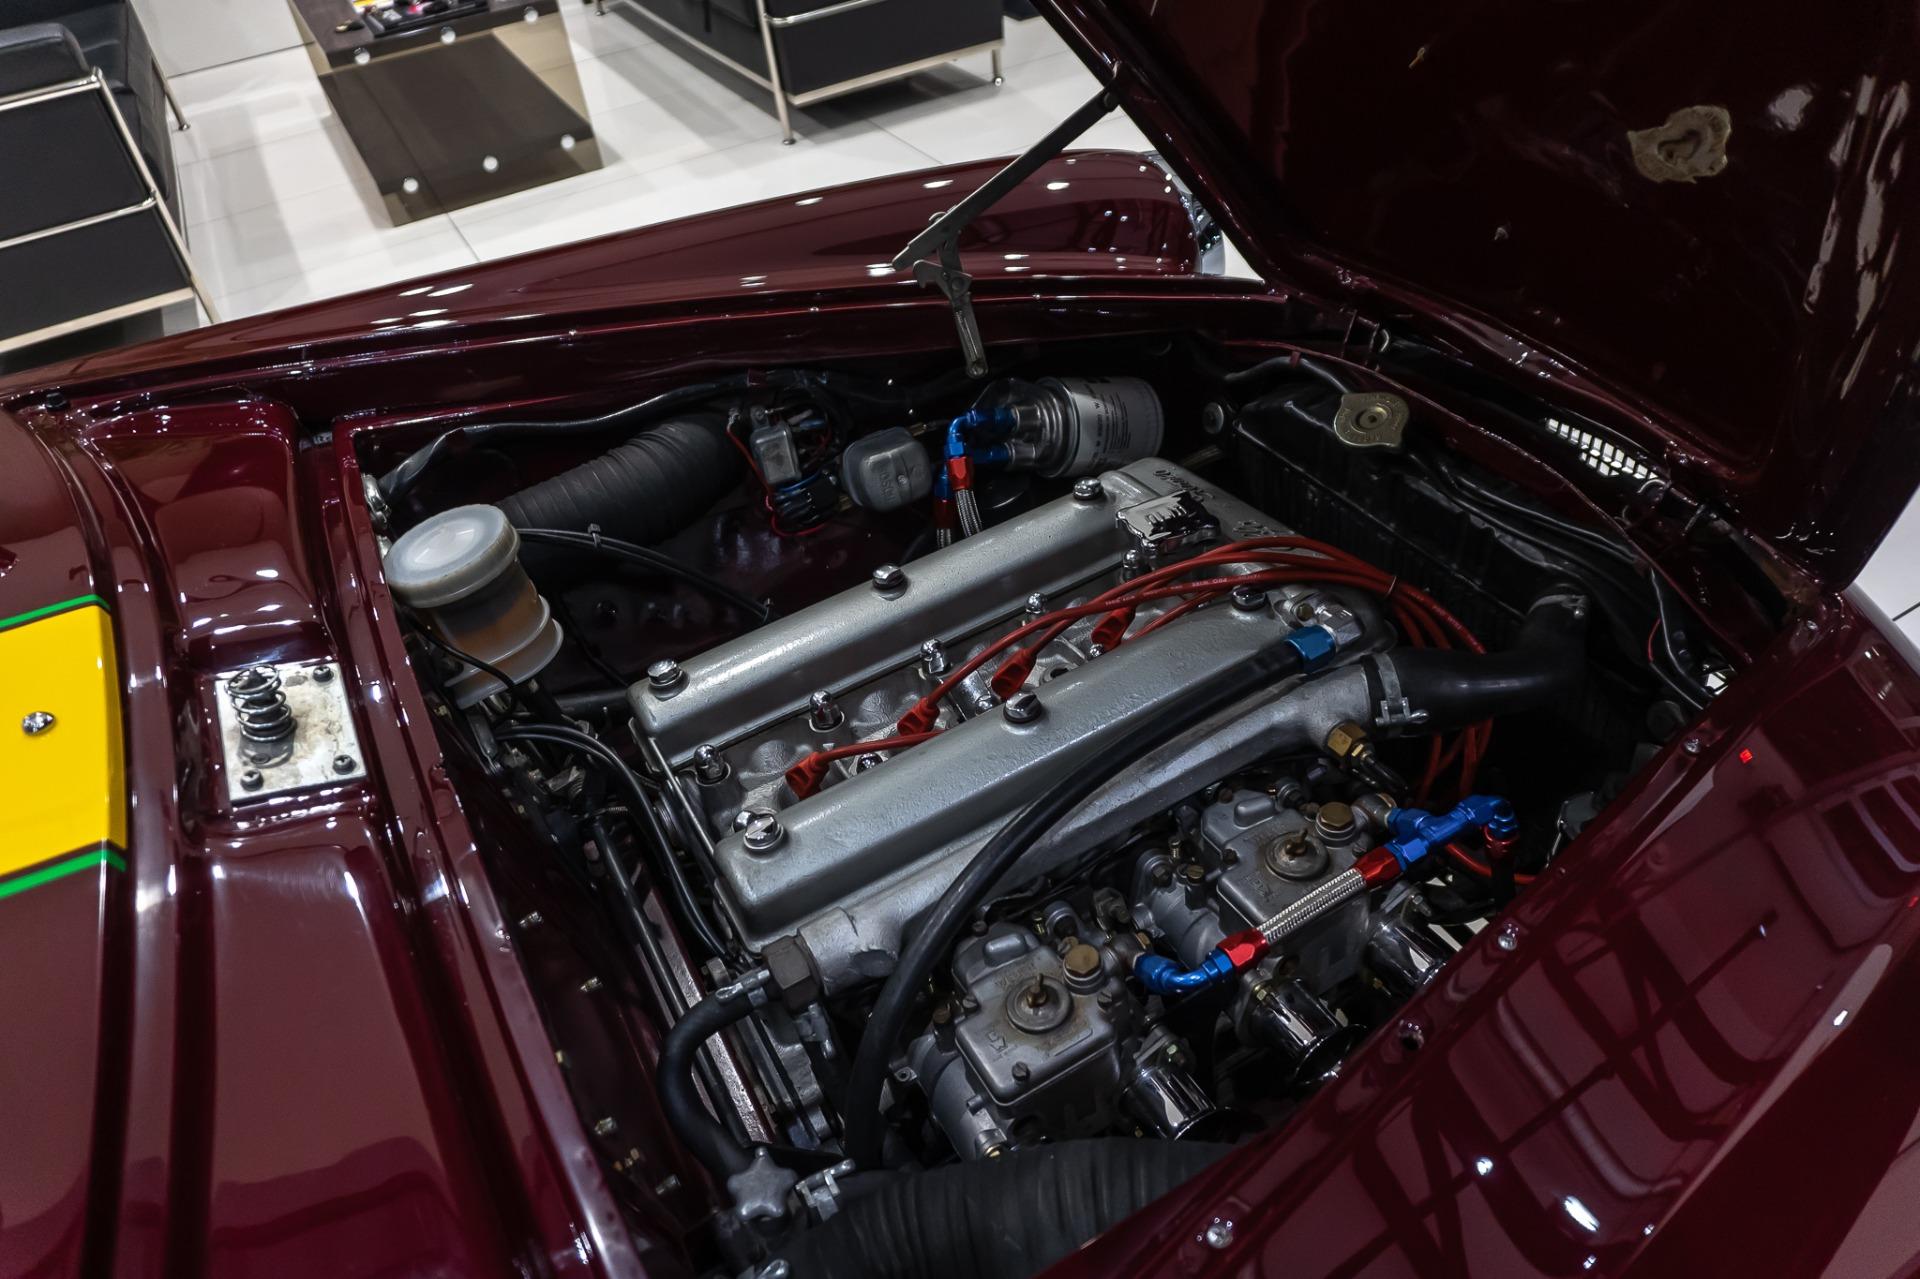 Used-1962-Alfa-Romeo-Giuliette-Sprint-101-Series-Rally-Car-Fully-Restored